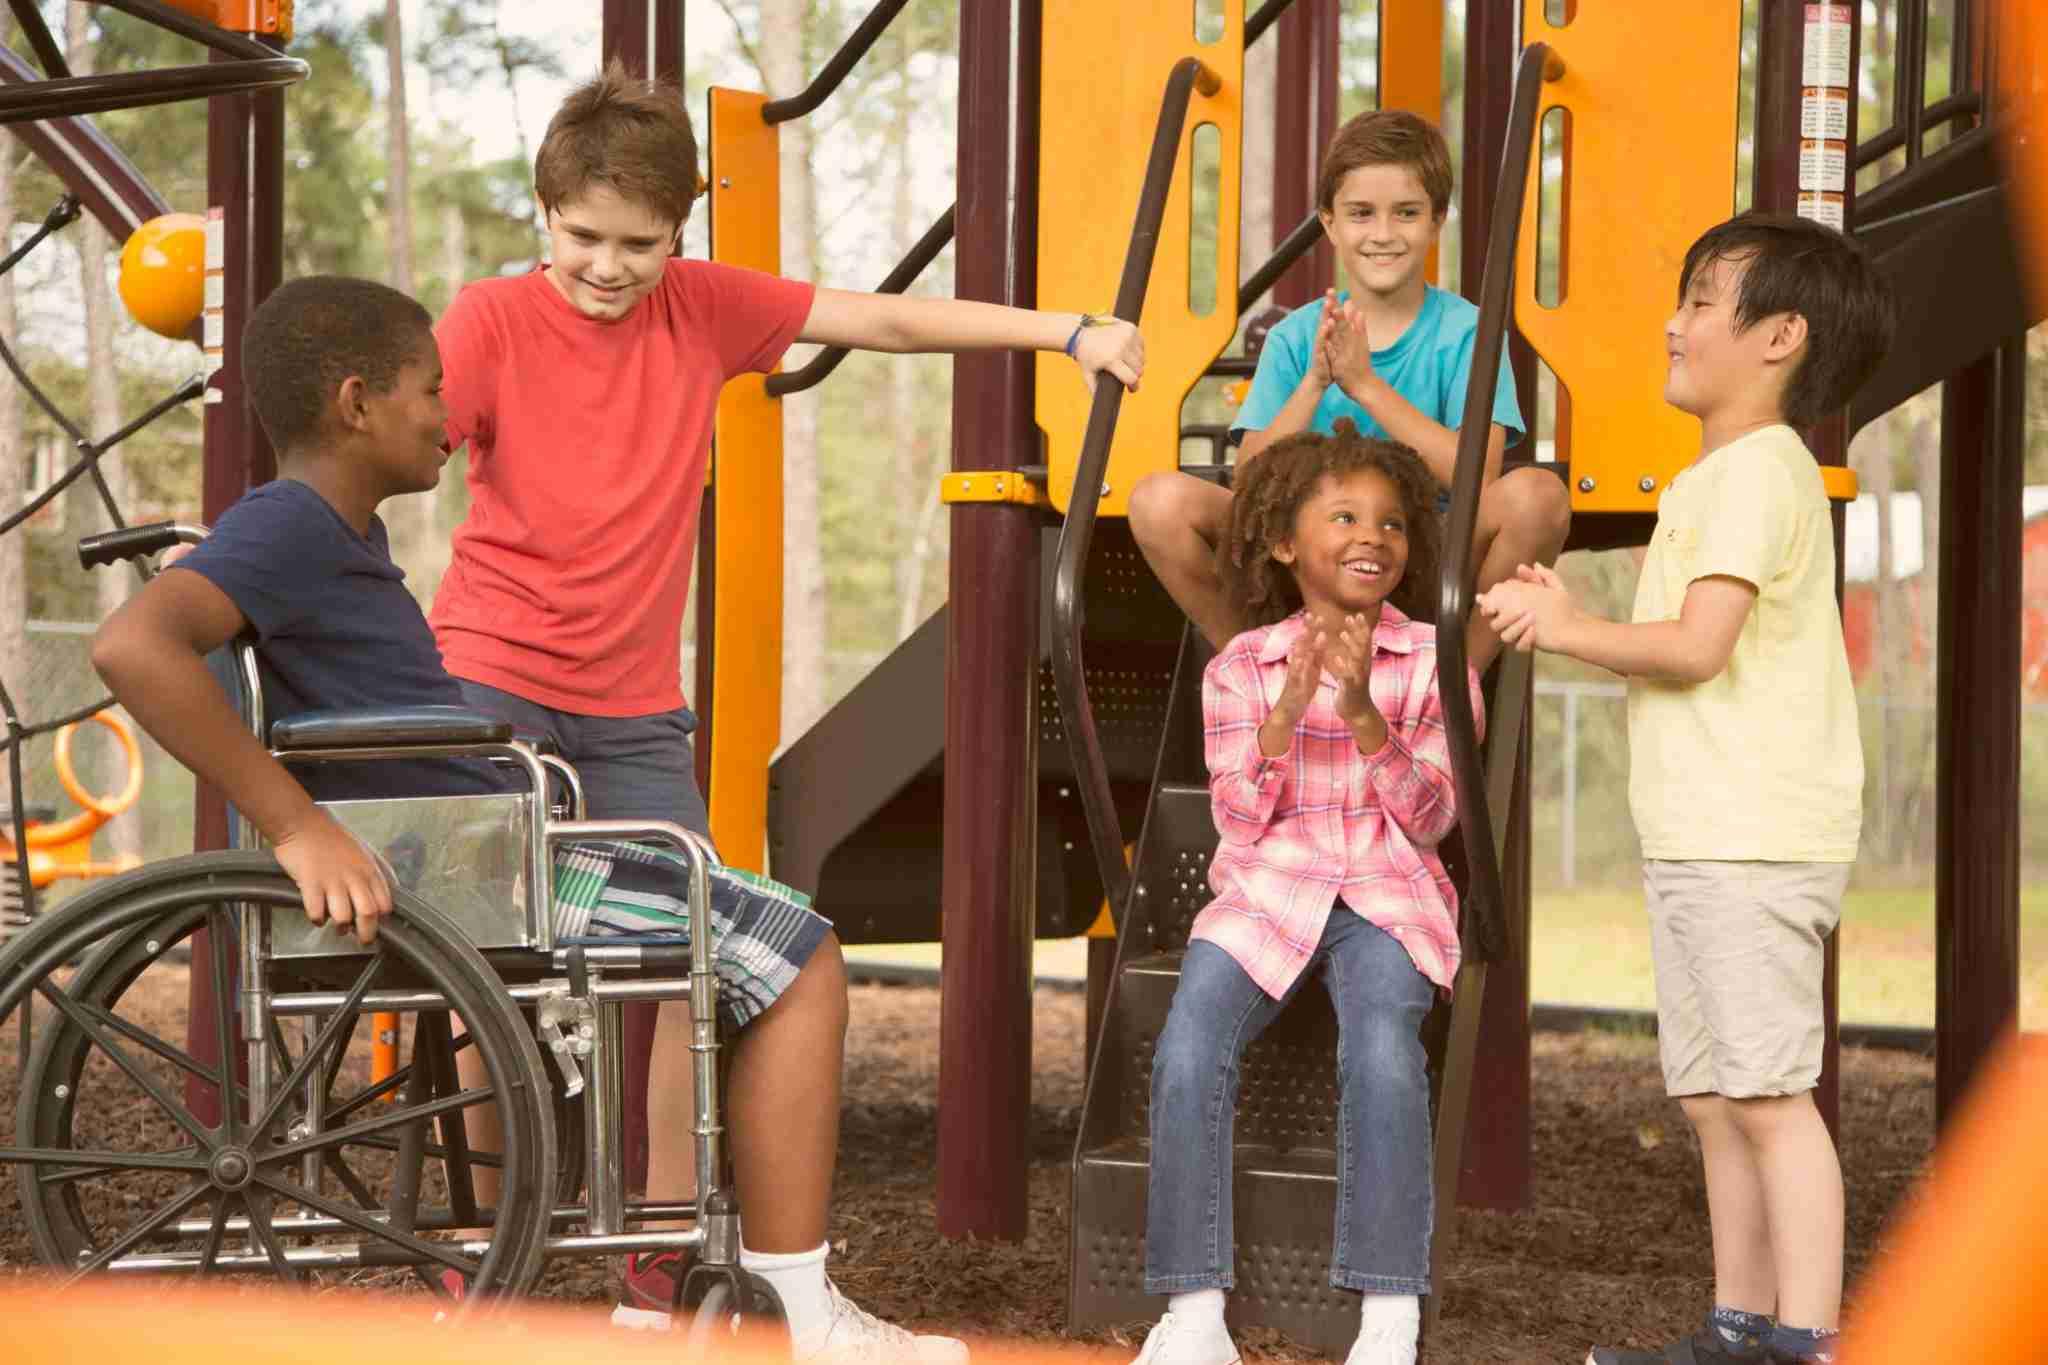 child in wheelchair at park